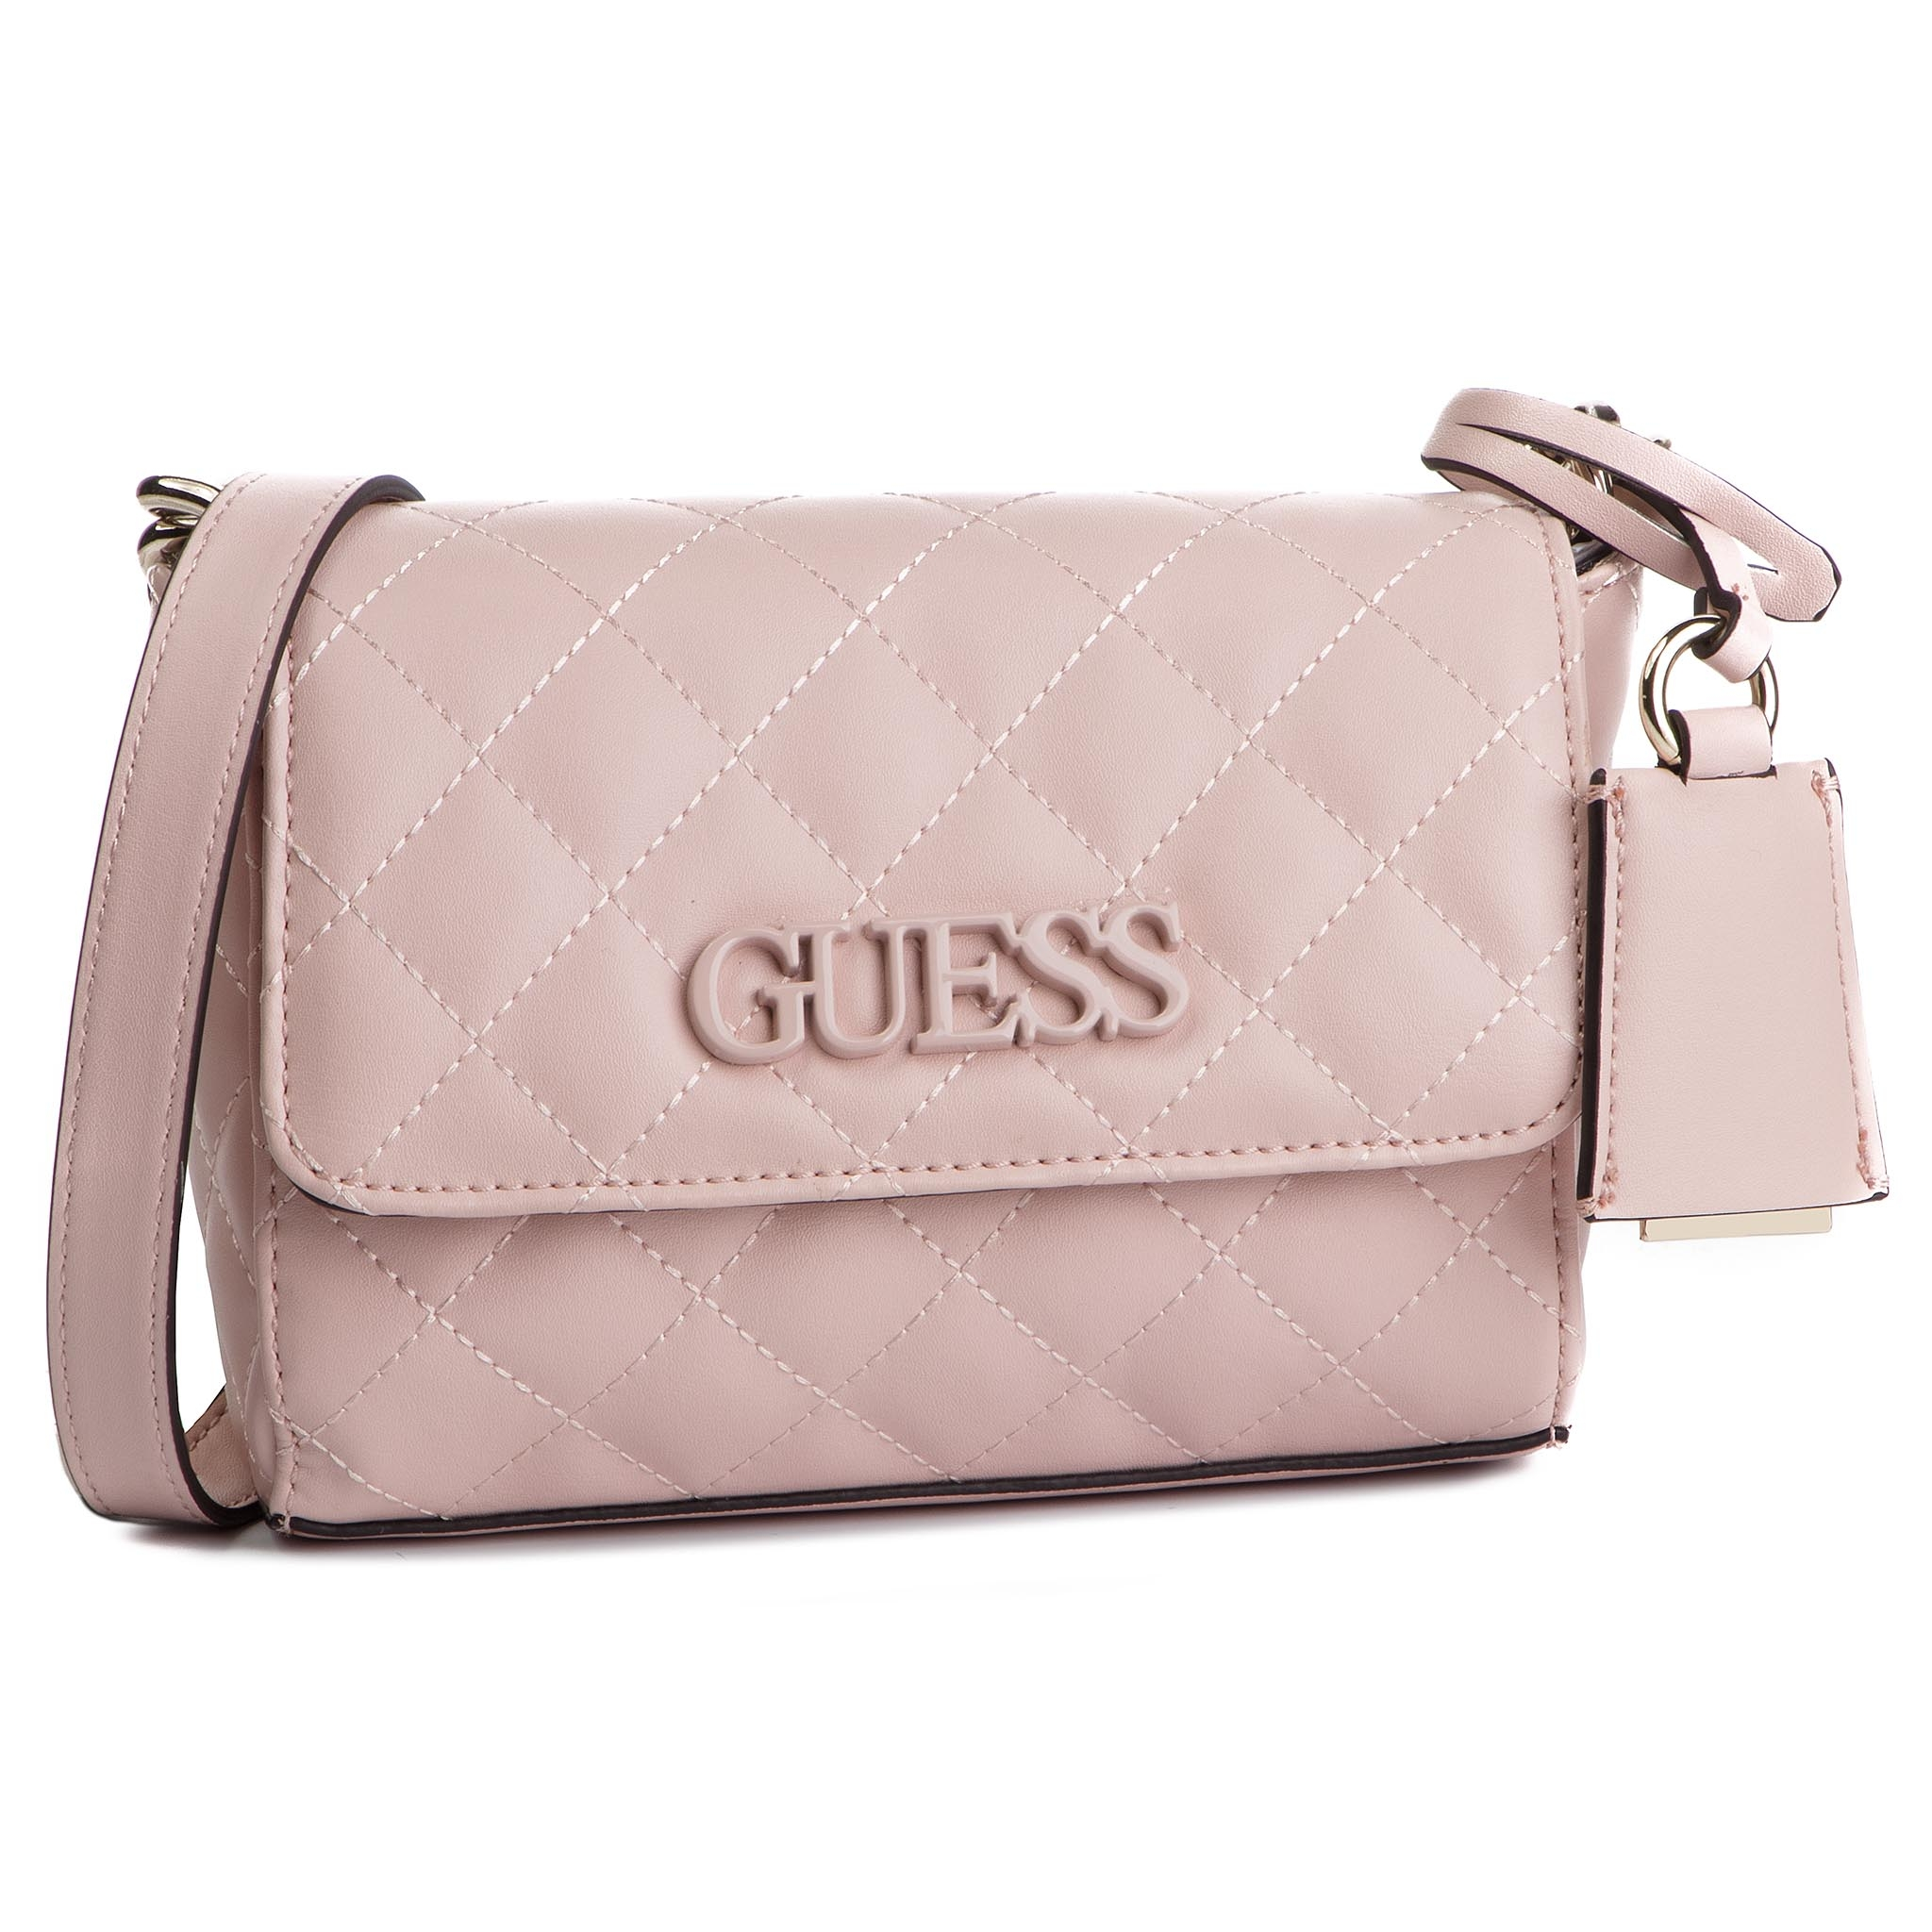 Personal Tuo Shophallo Women Il Borsa Rosa Donna Shopping Assistant wRYqPYS 00a68e3eaf1